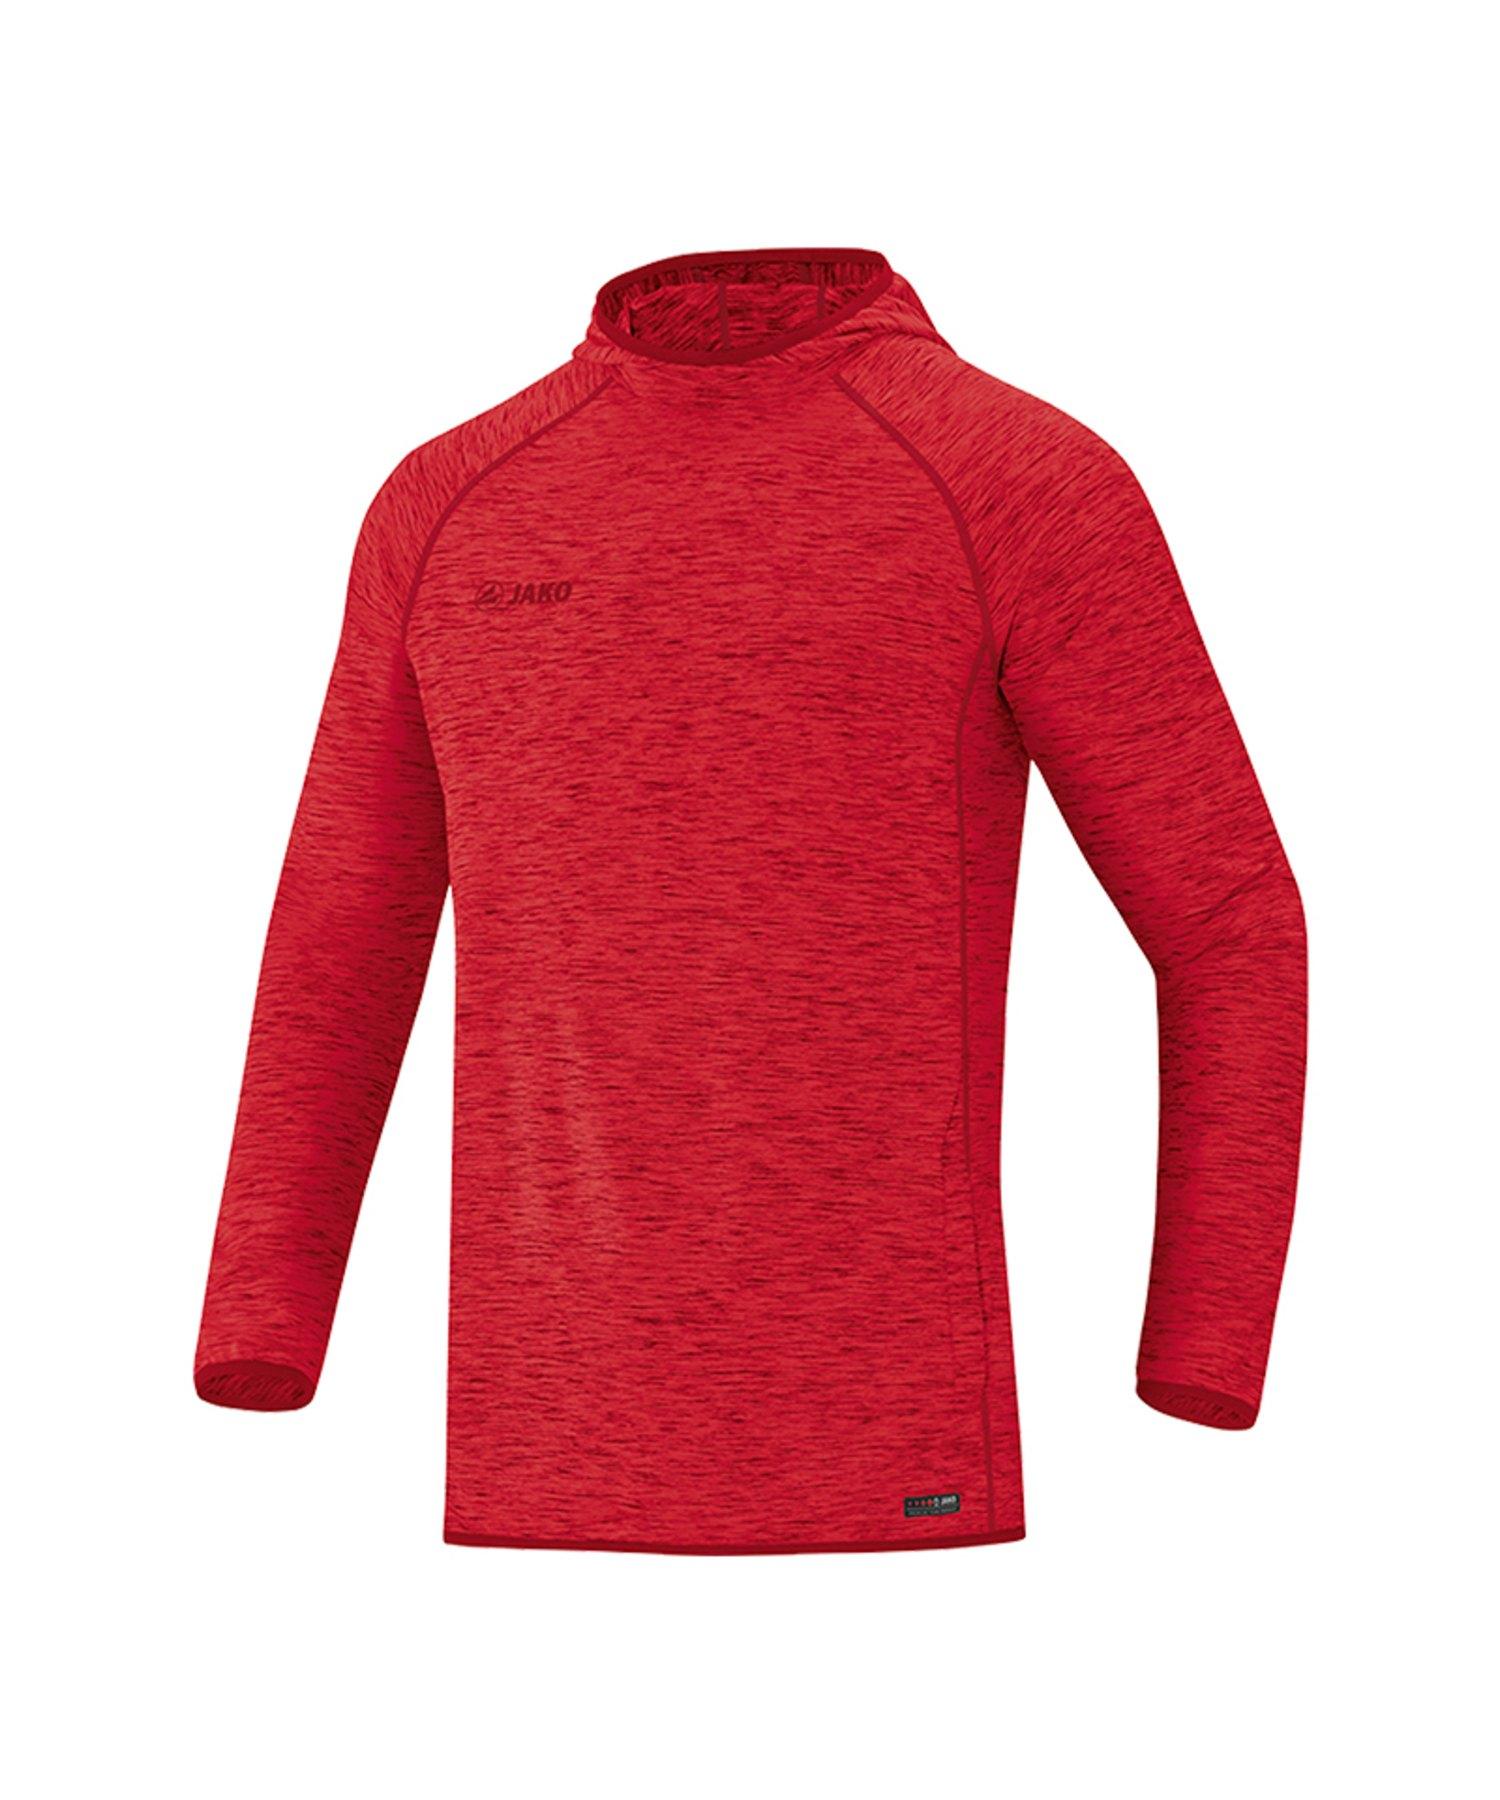 Jako Active Kapuzensweatshirt Rot F01 - Rot